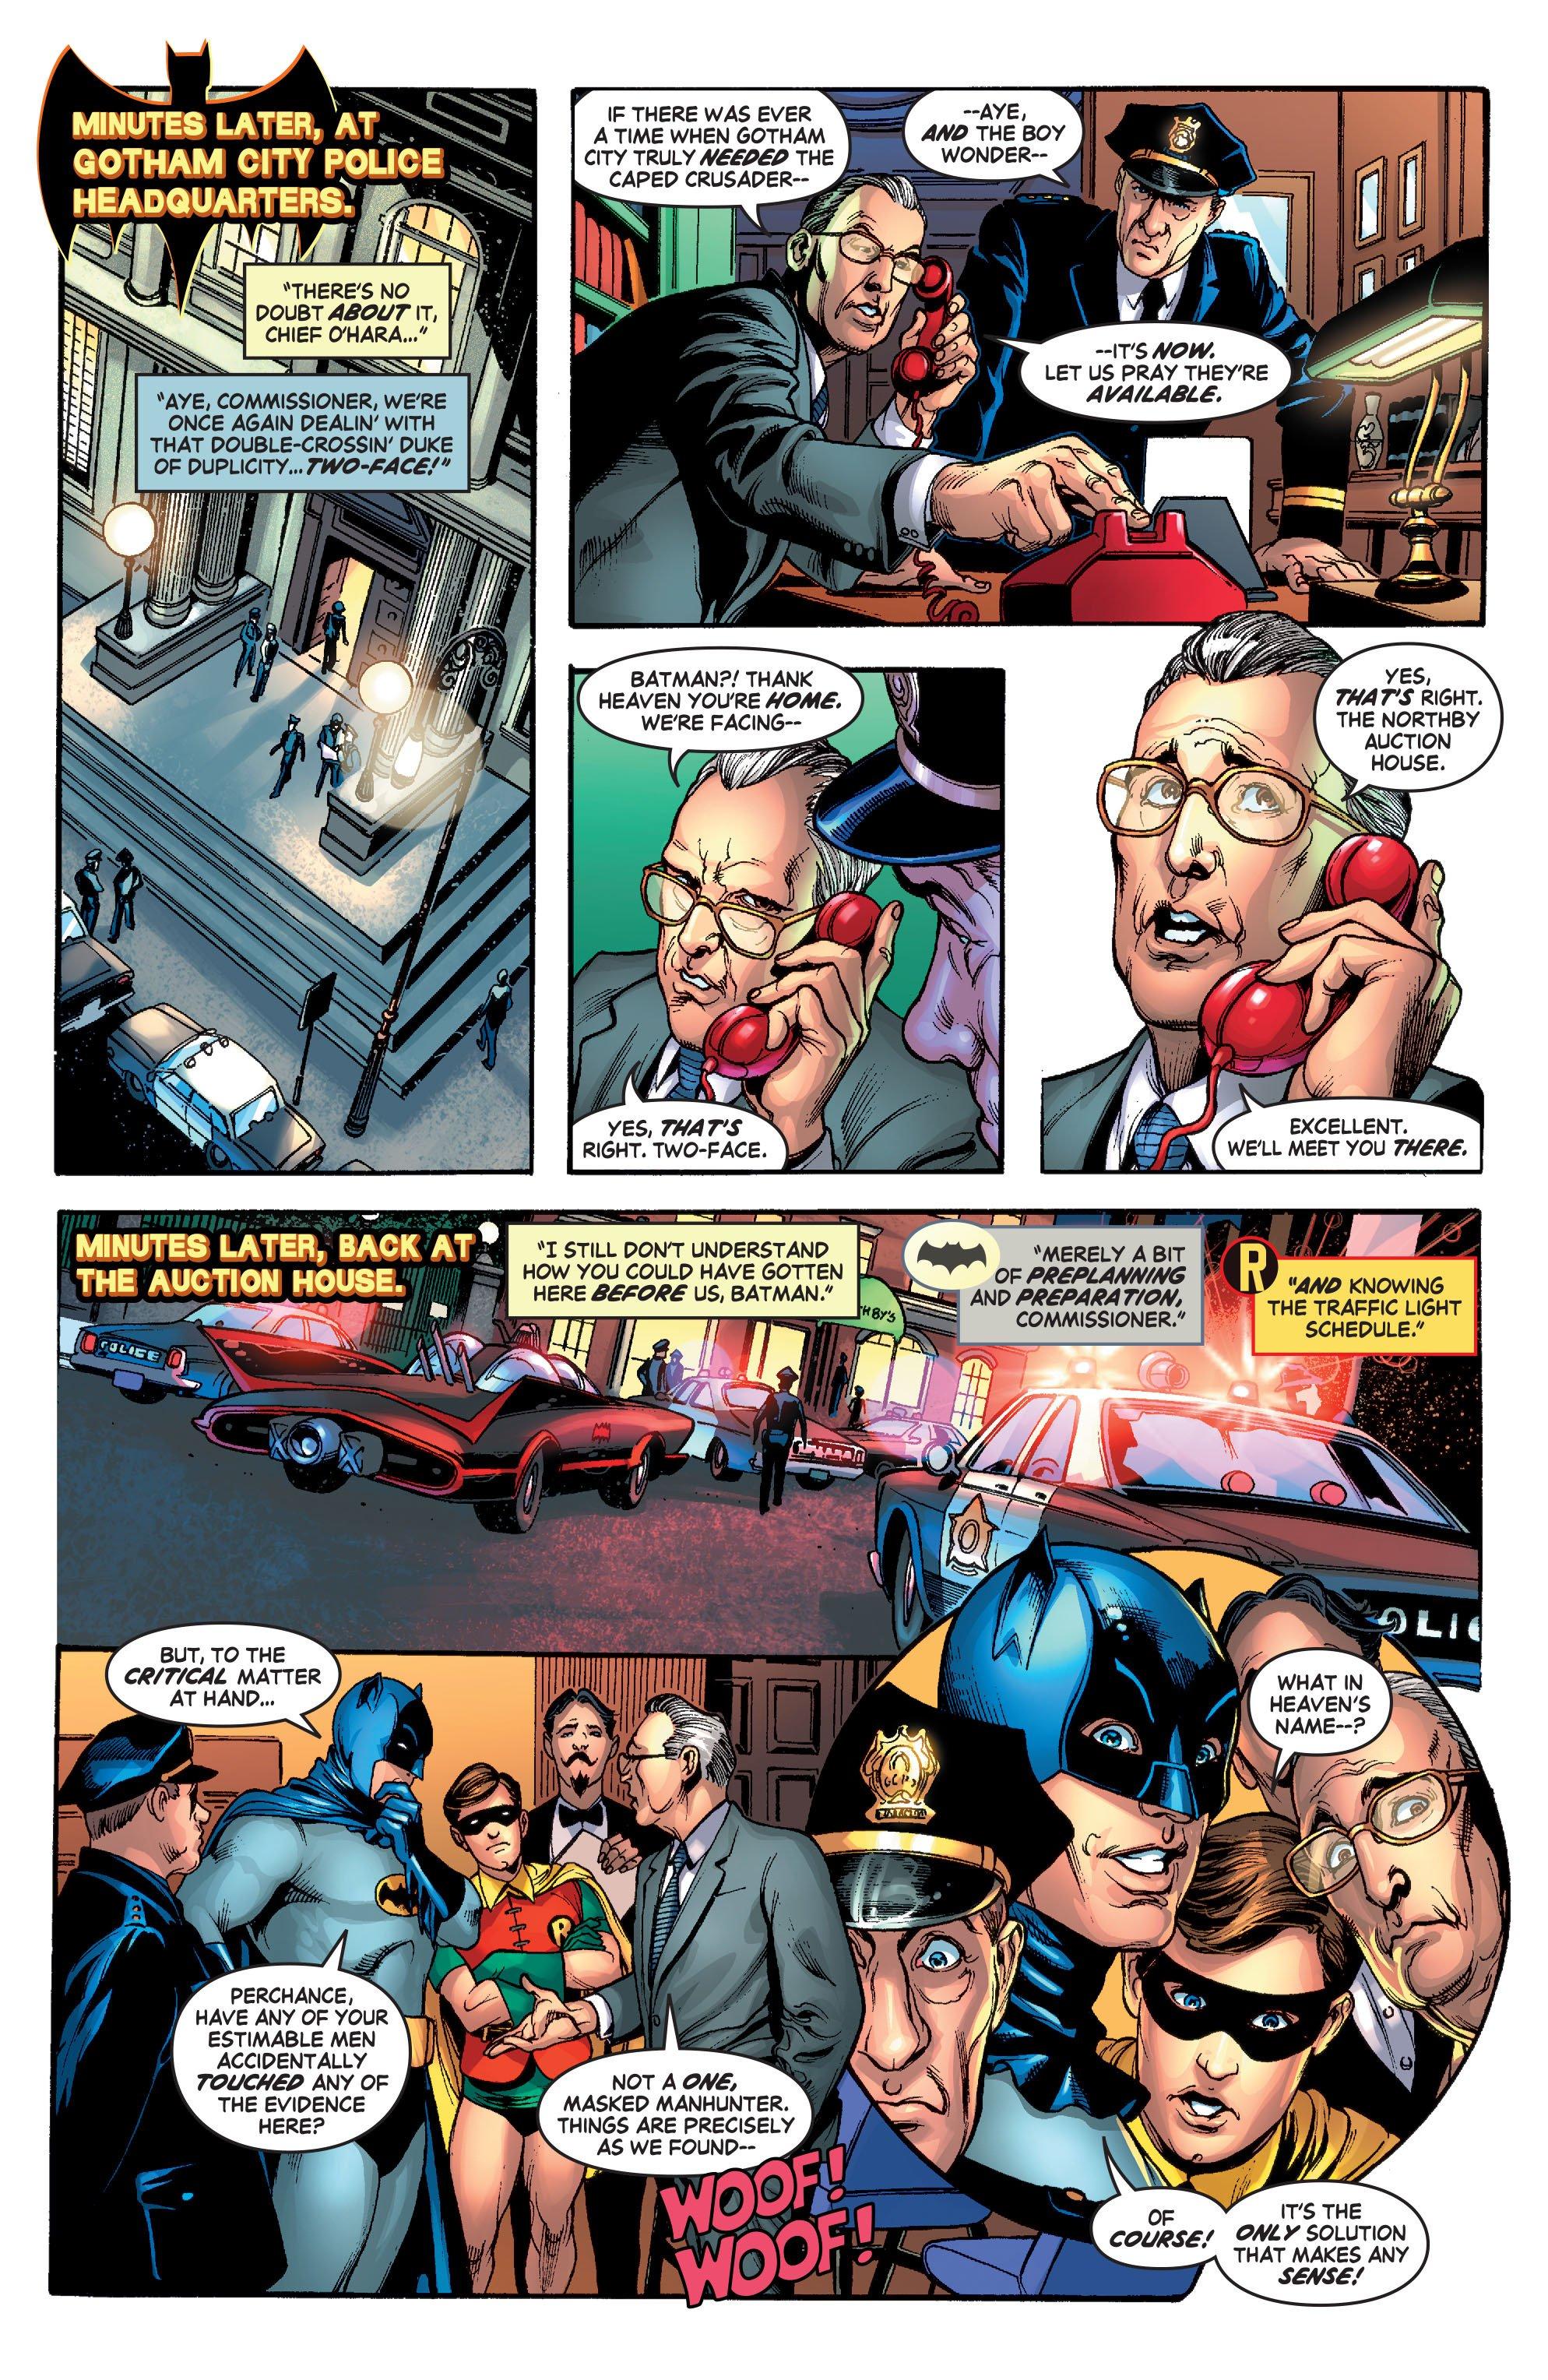 Batman '66 Omnibus review